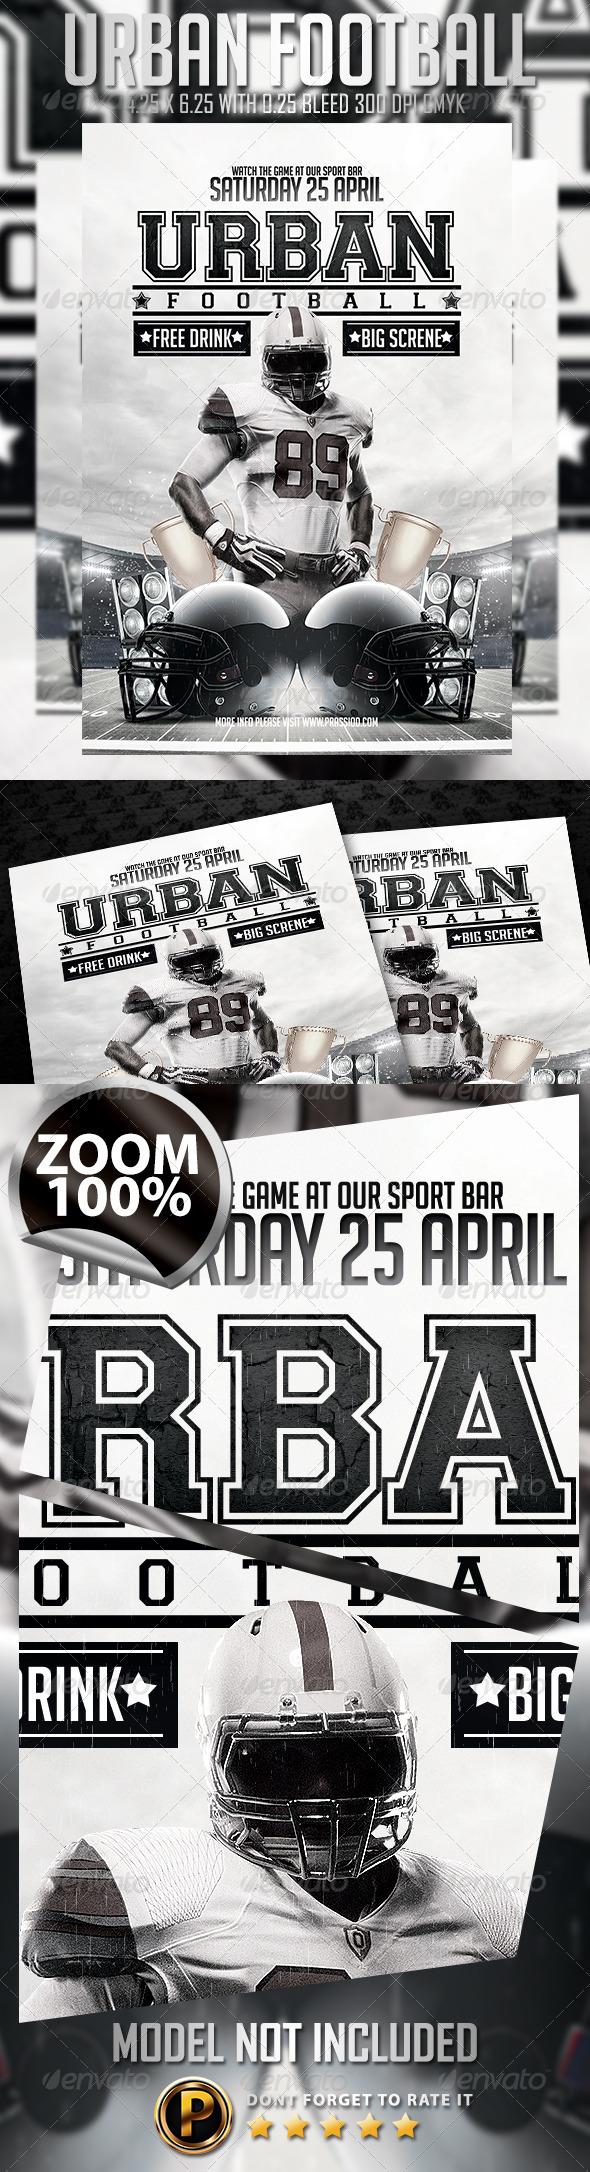 Urban Football Flyer Template - Sports Events